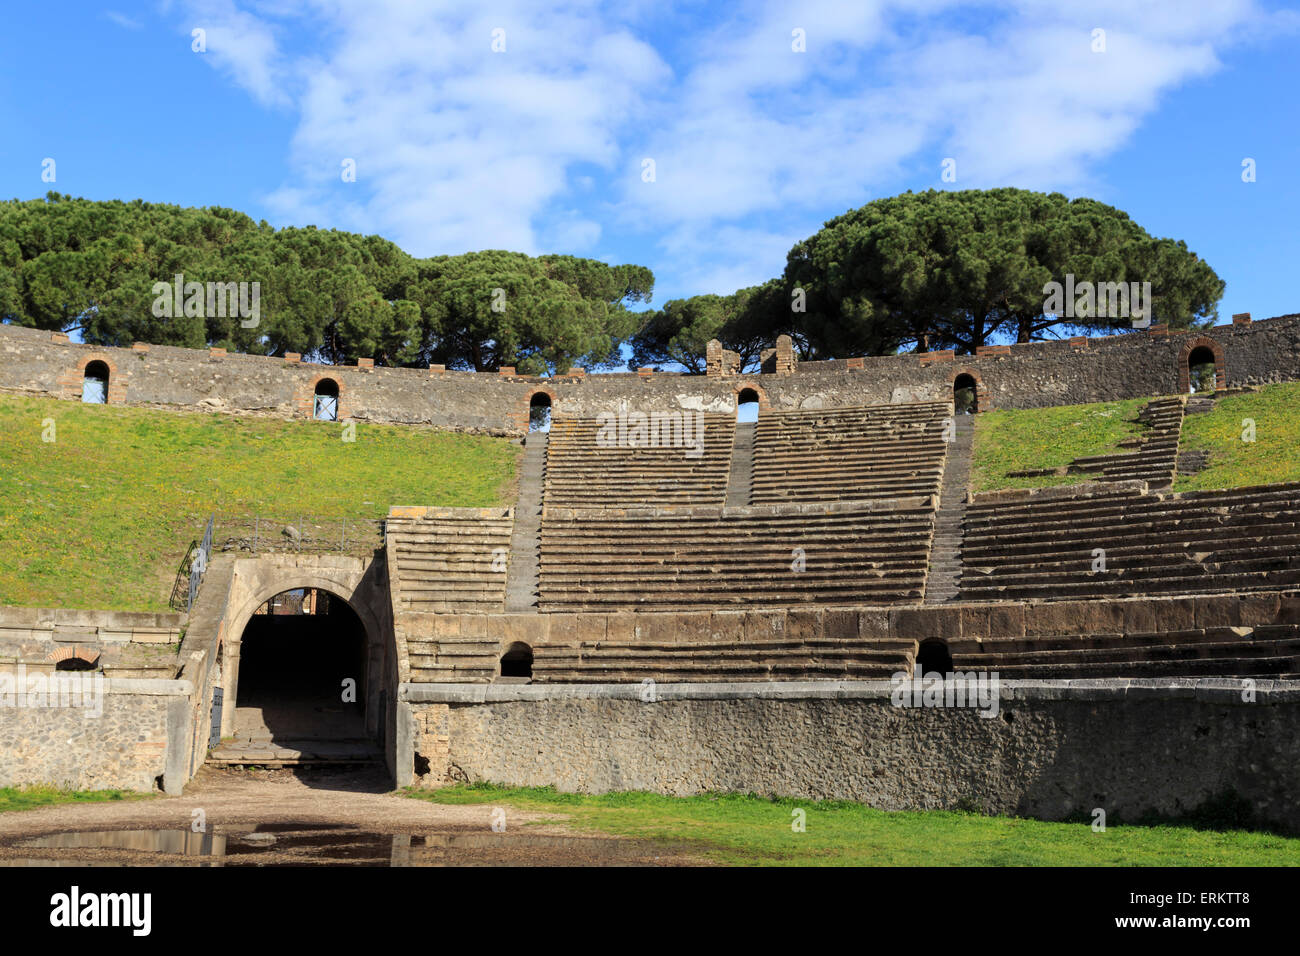 Auditorium and entrance gate, Amphitheatre, Roman ruins of Pompeii, UNESCO World Heritage Site, Campania, Italy, - Stock Image